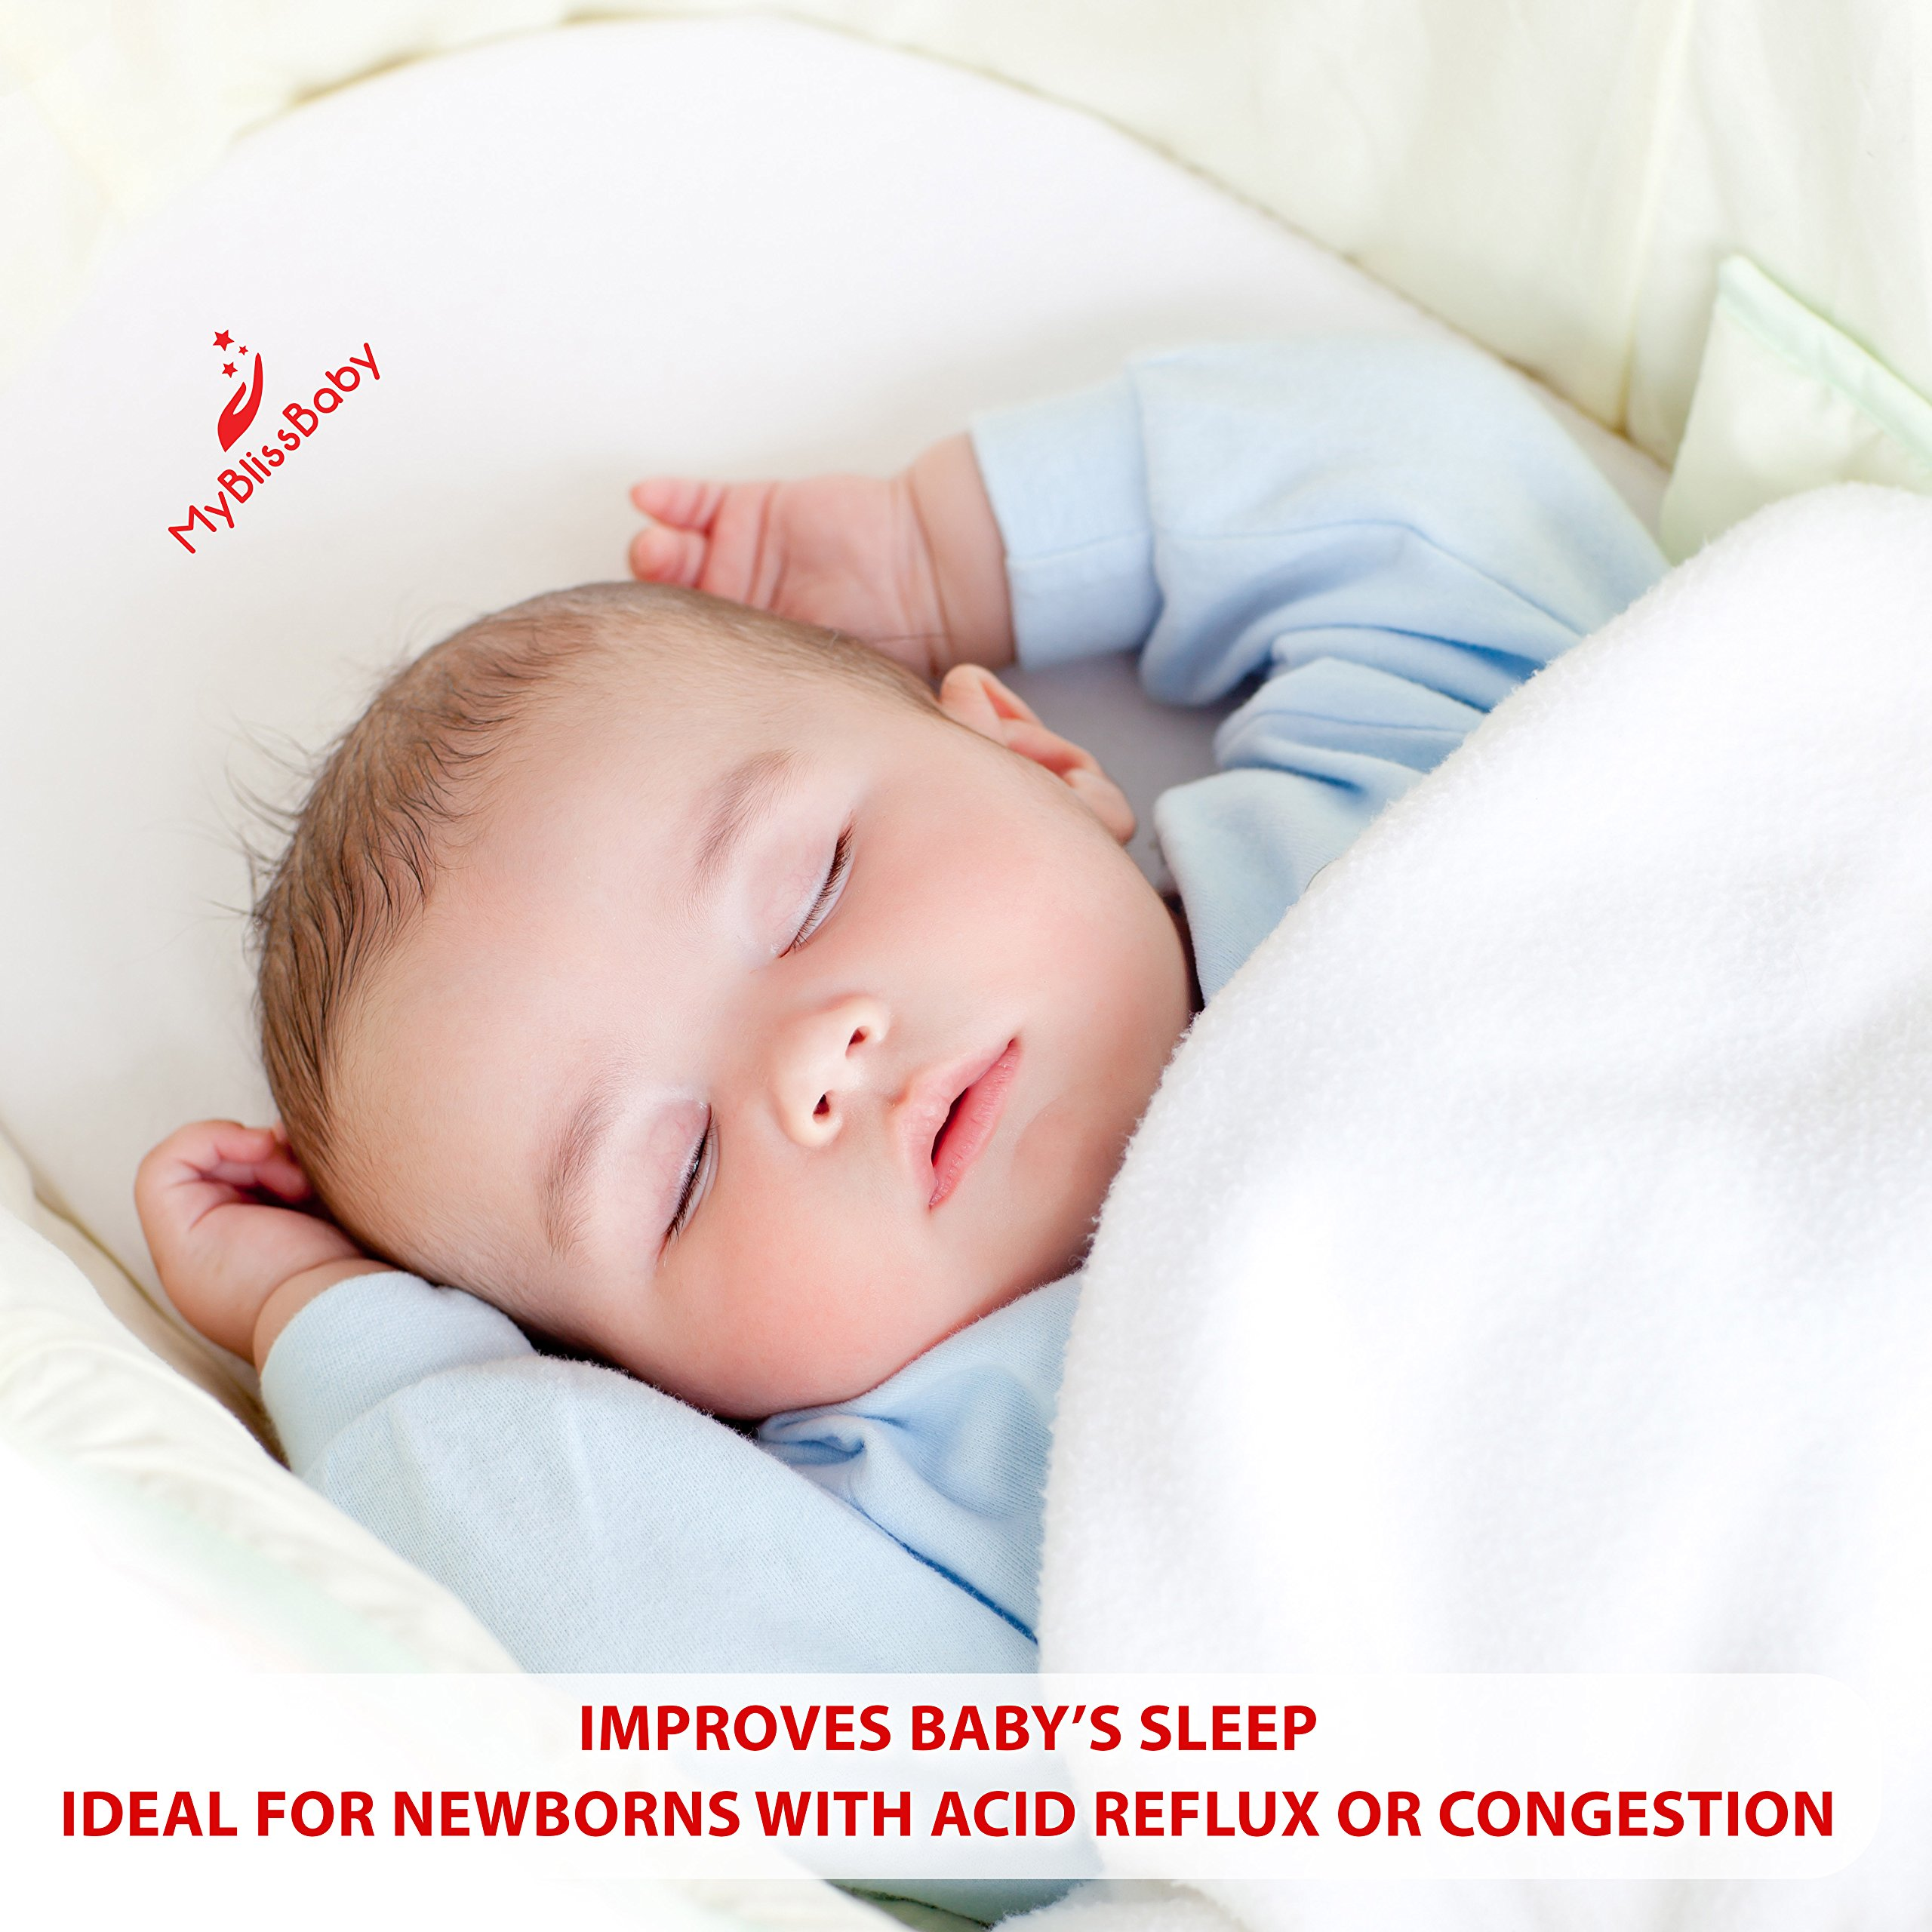 Aurelius Universal Crib Wedge for Baby Reflux Memory Foam Infant Sleep Pillow Wedge,26/×13/×3,White